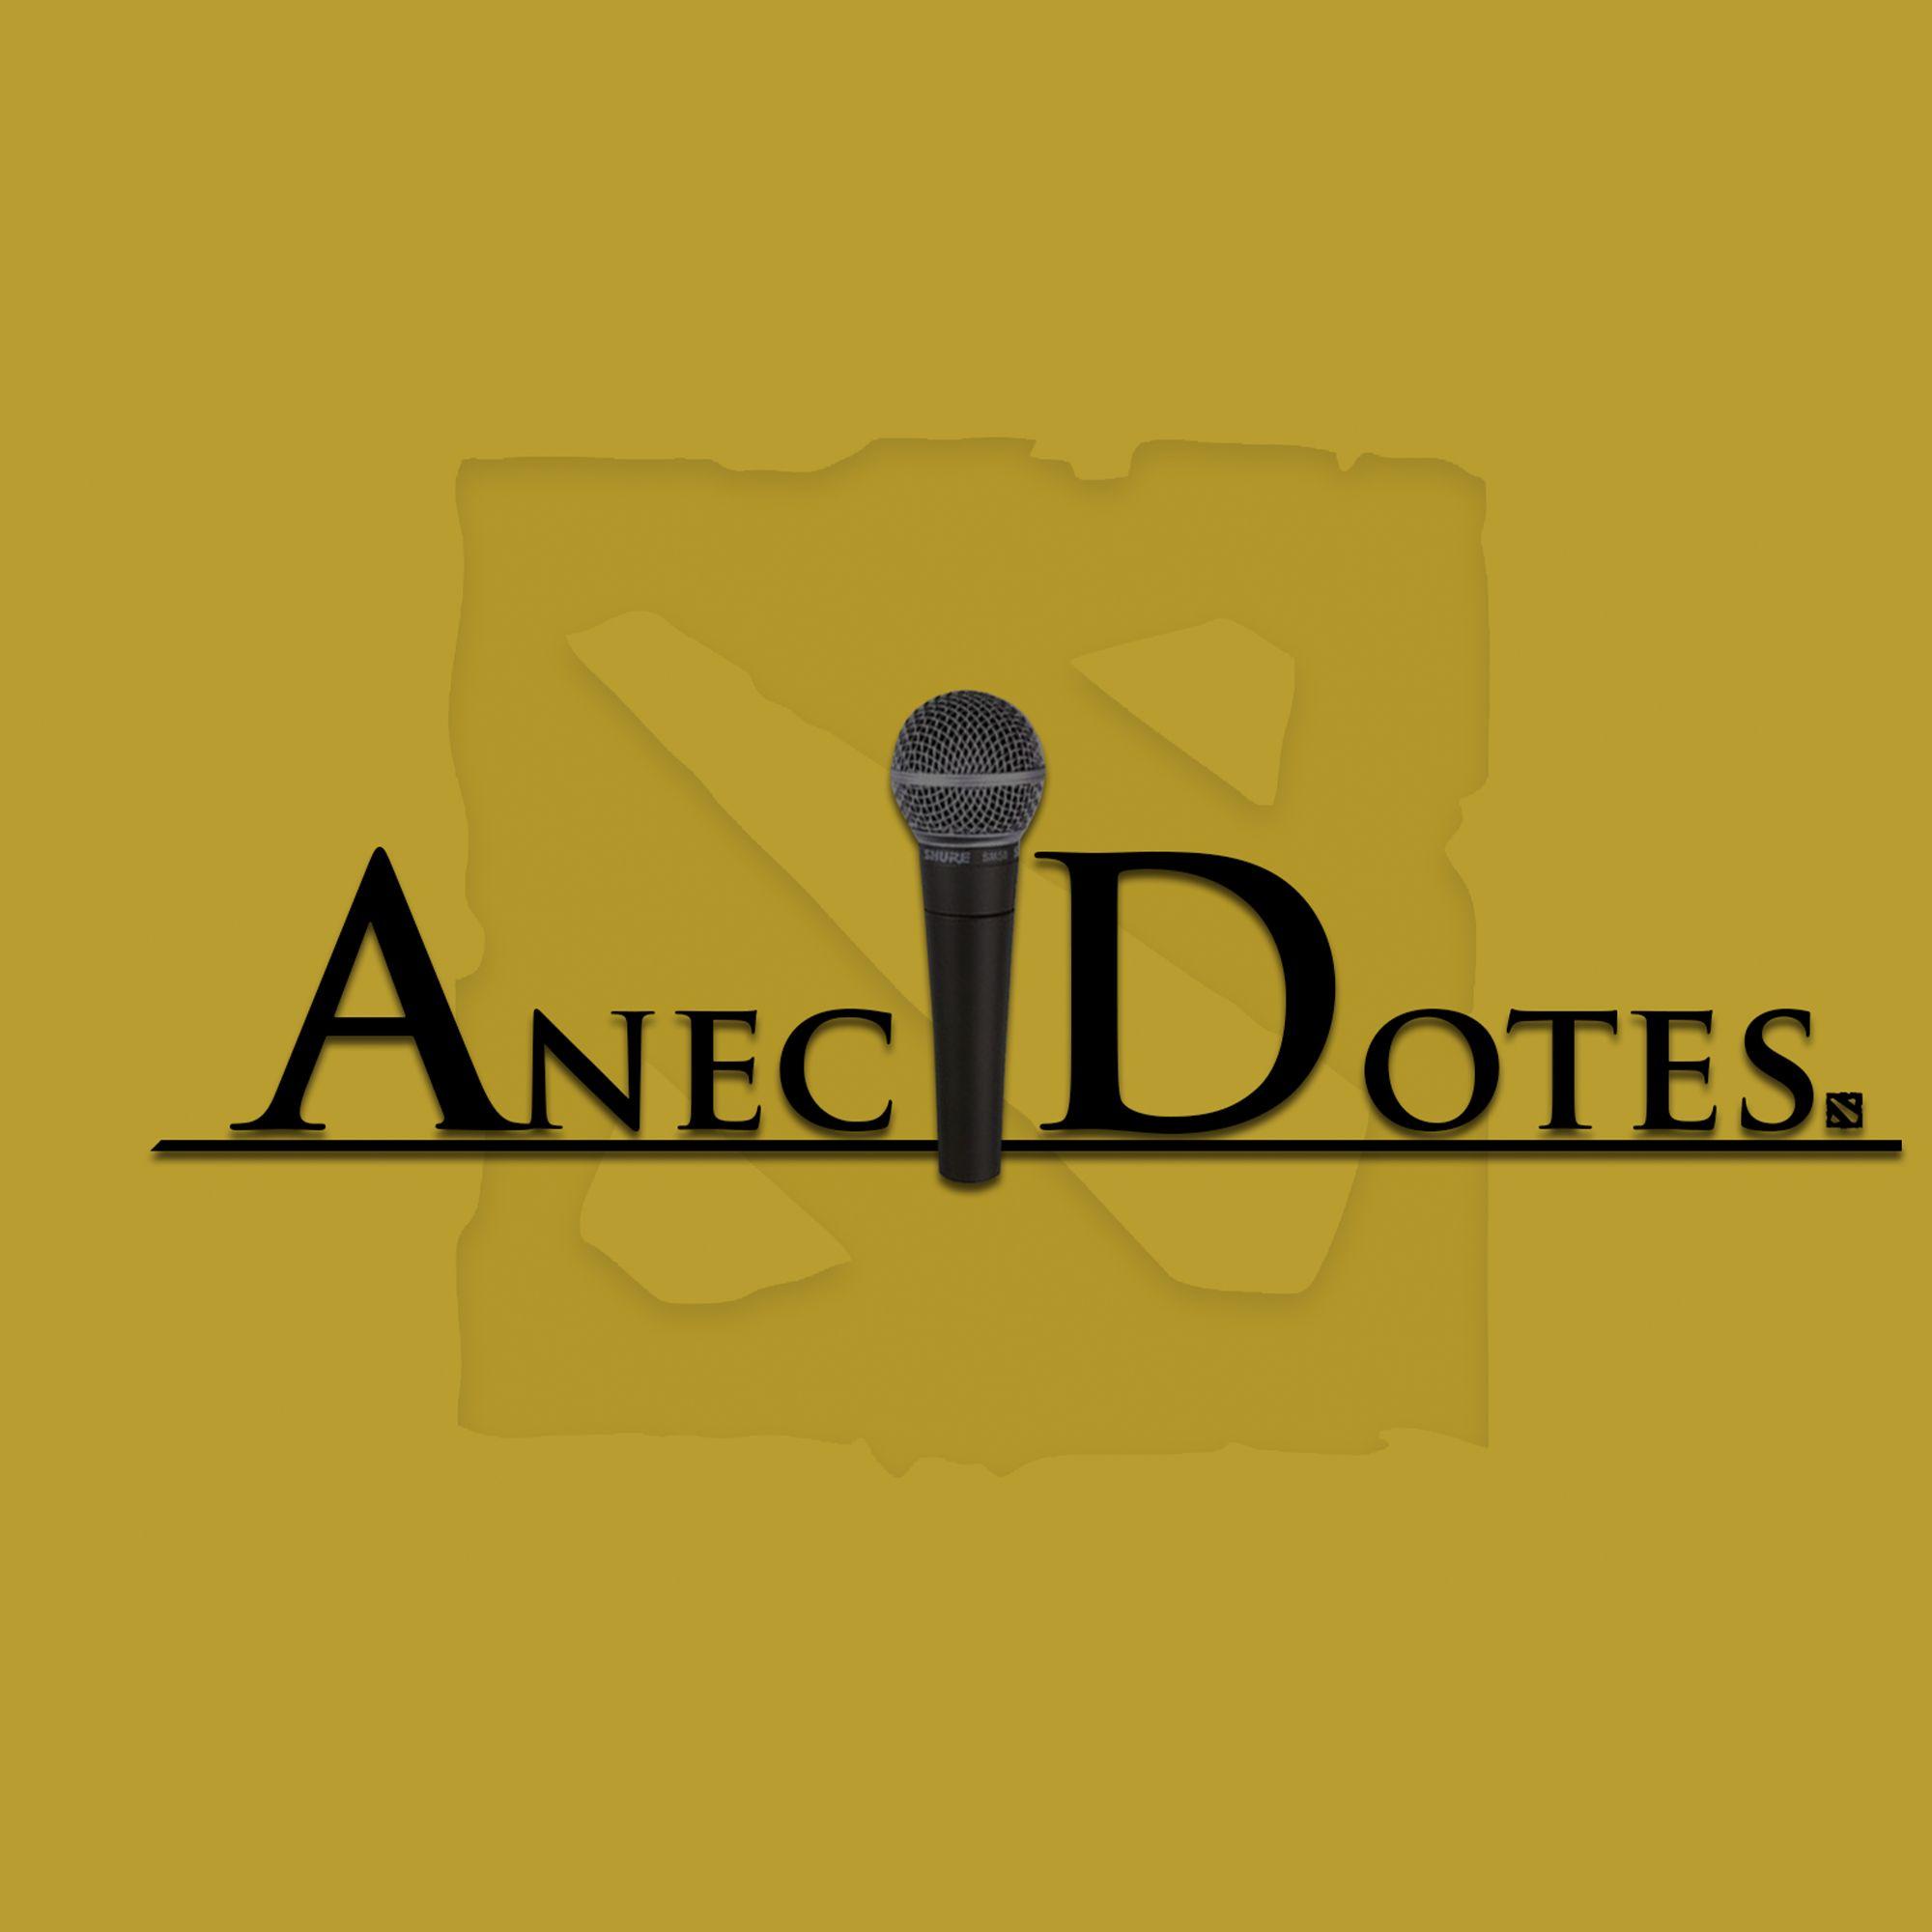 AnecDotes Season 2 Episode 3 - The One About Taking Breaks